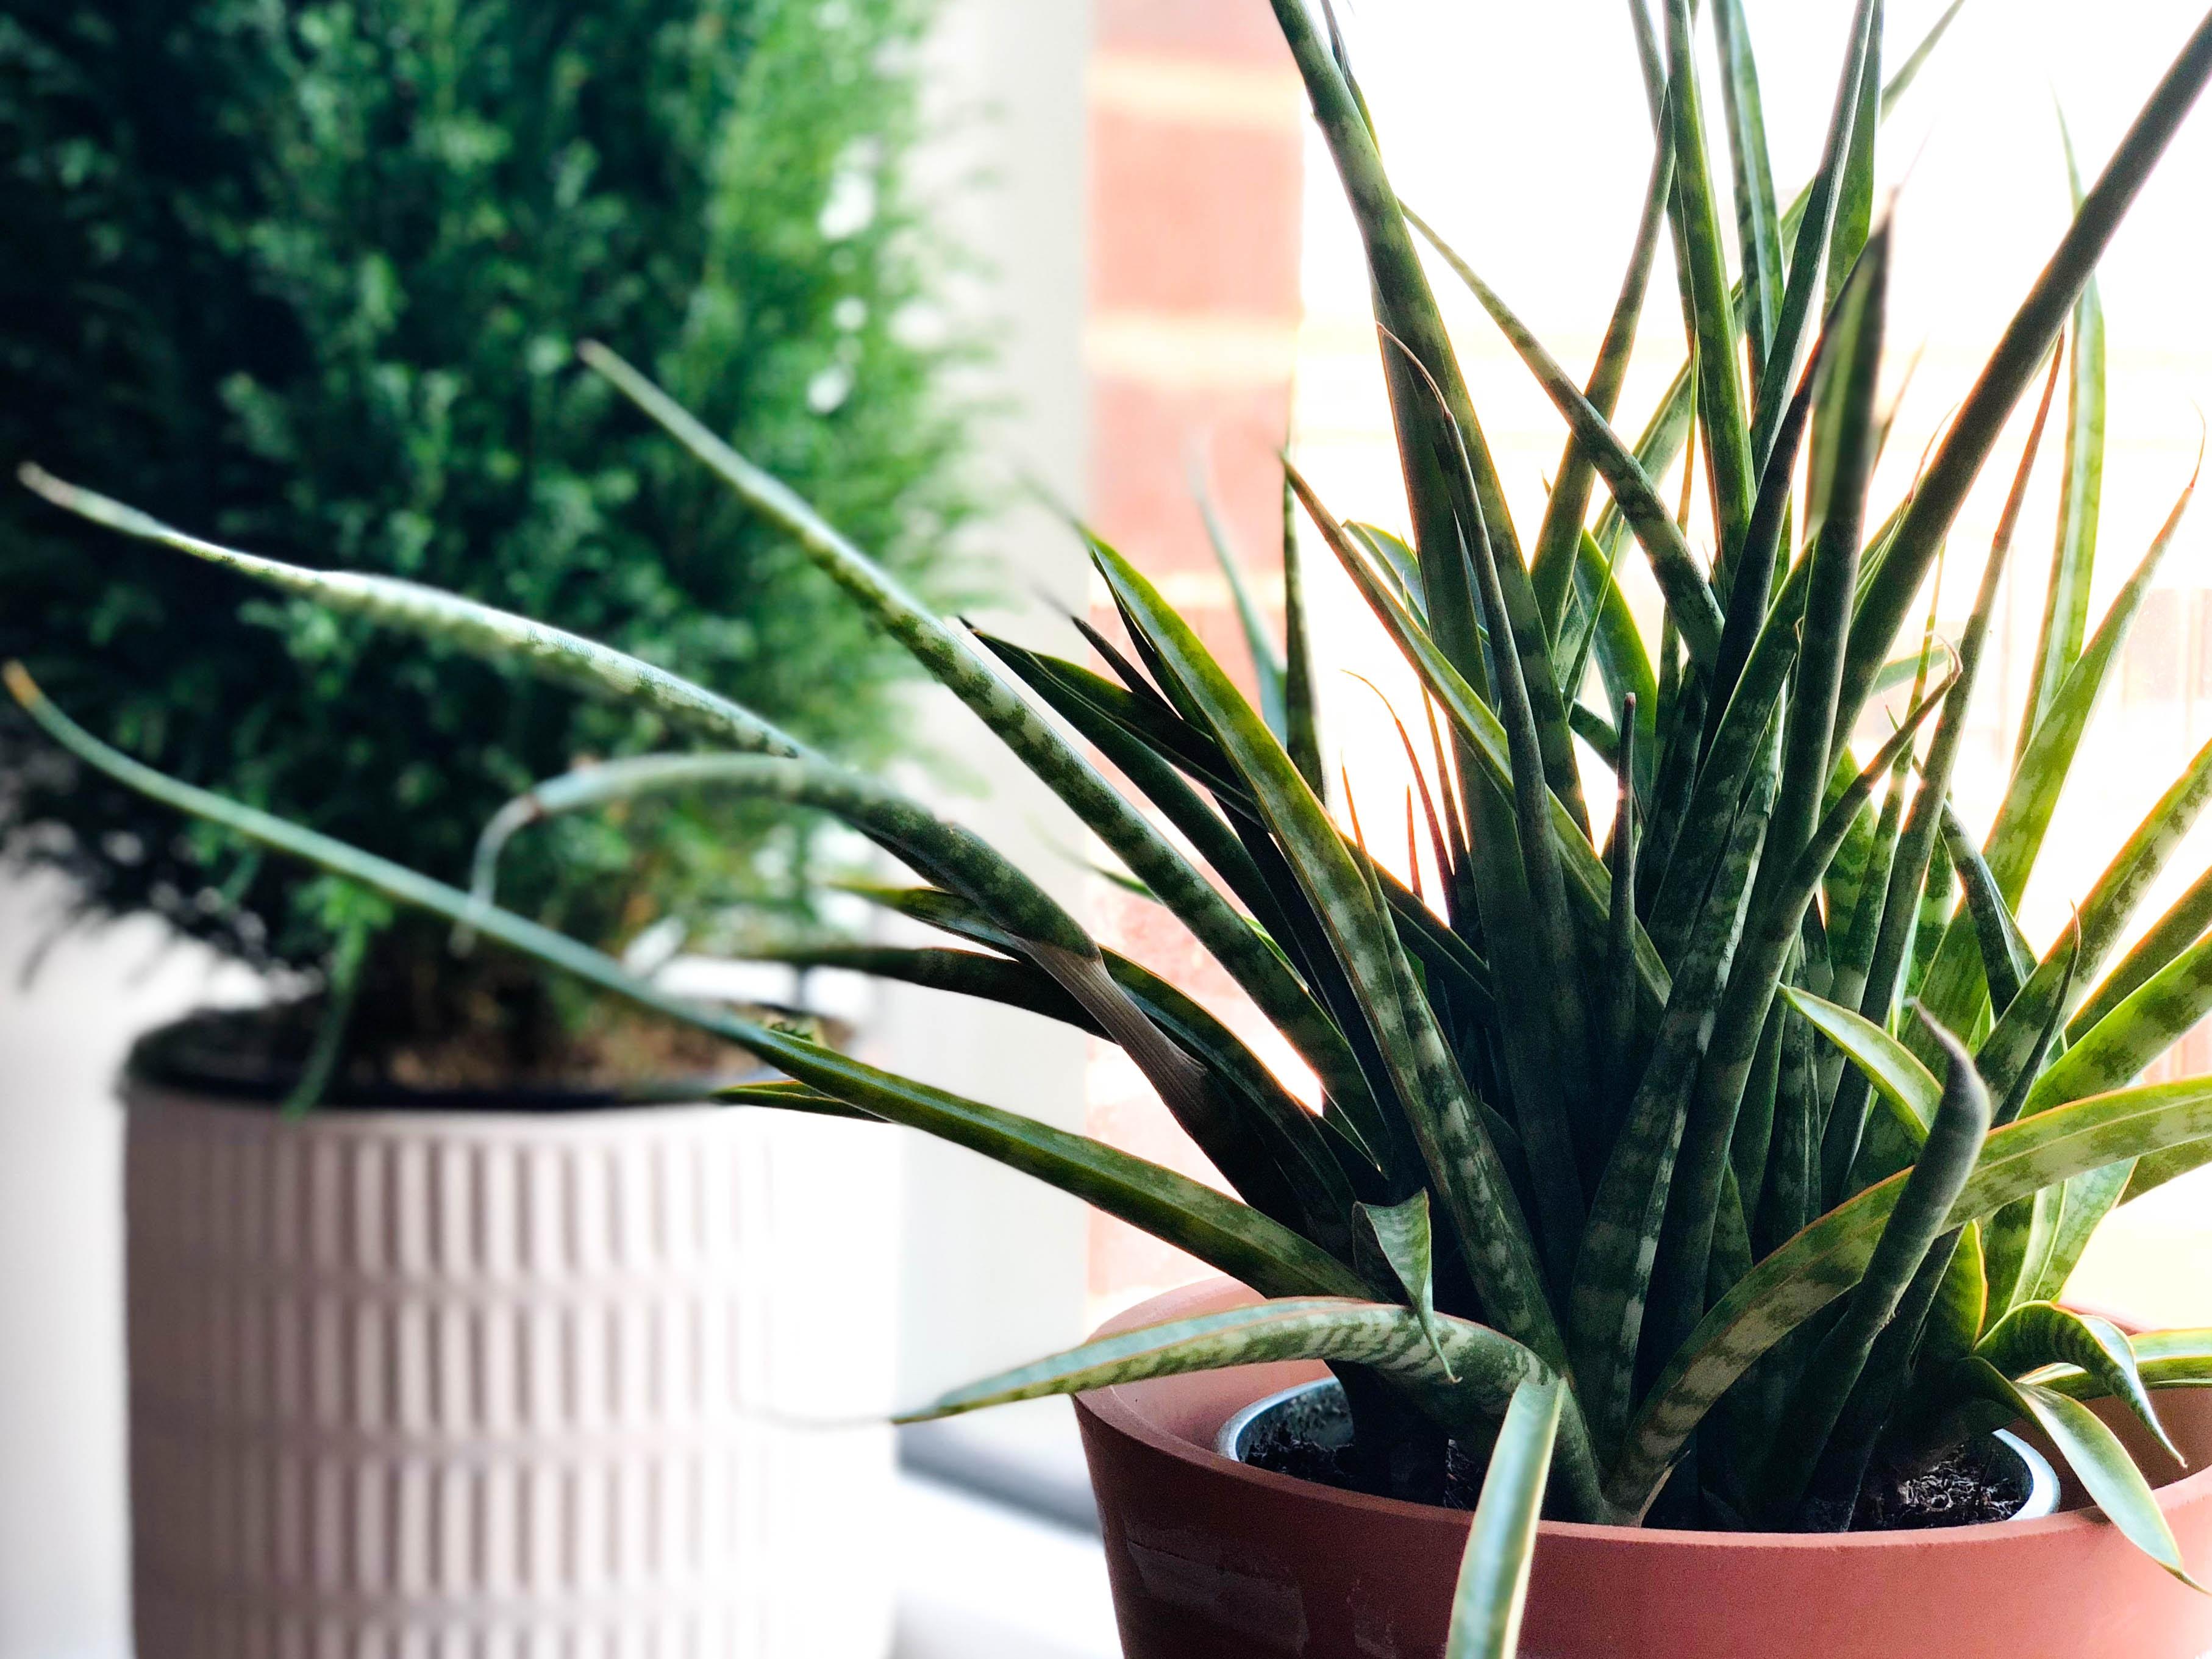 green plants on brown pot